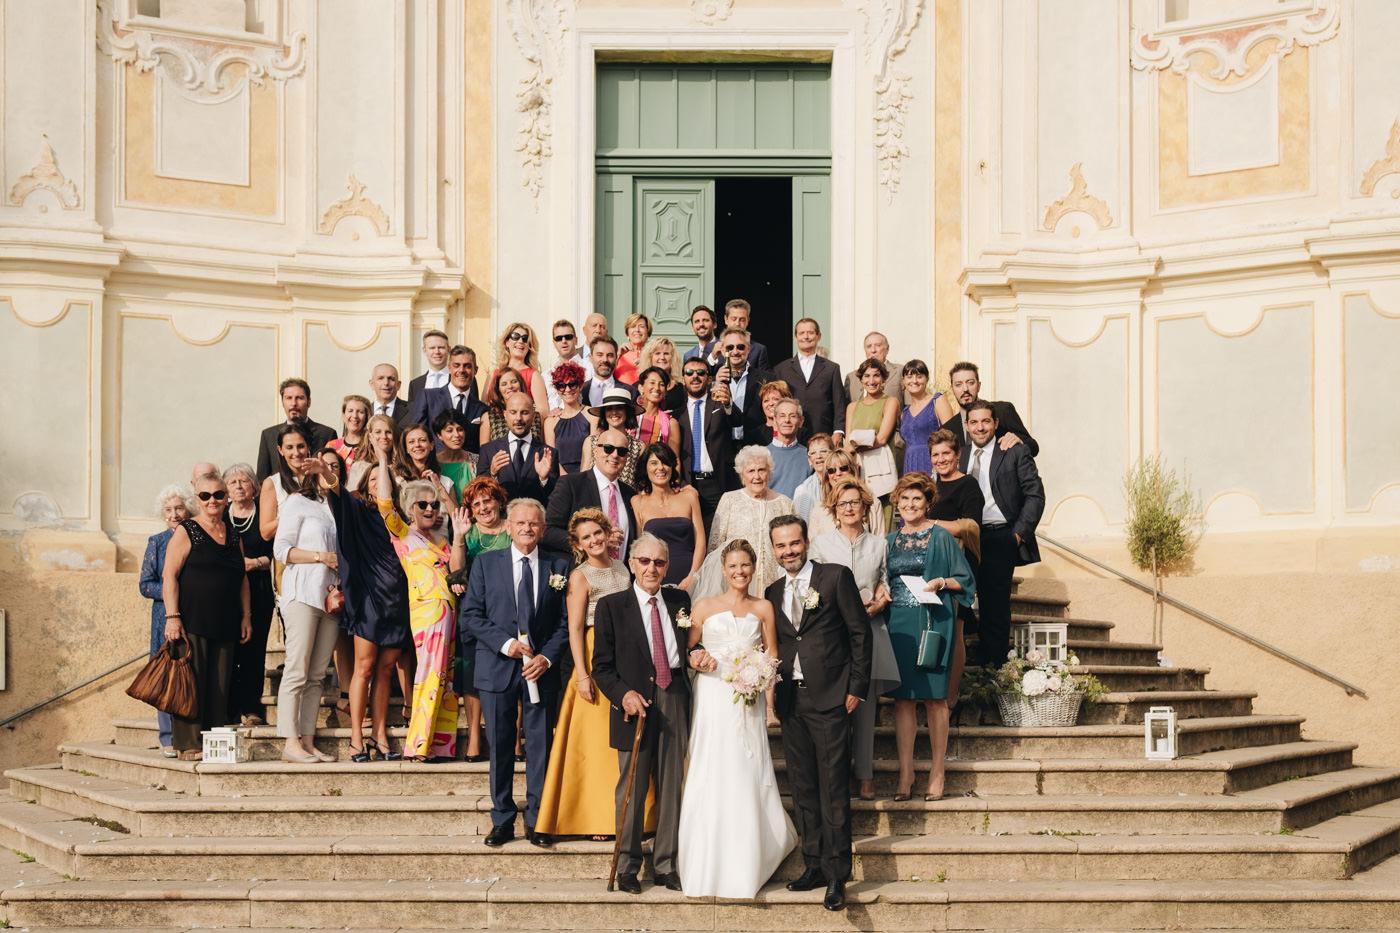 matrimoni_all_italiana_fotografo_matrimonio_cinque_terre-38.jpg